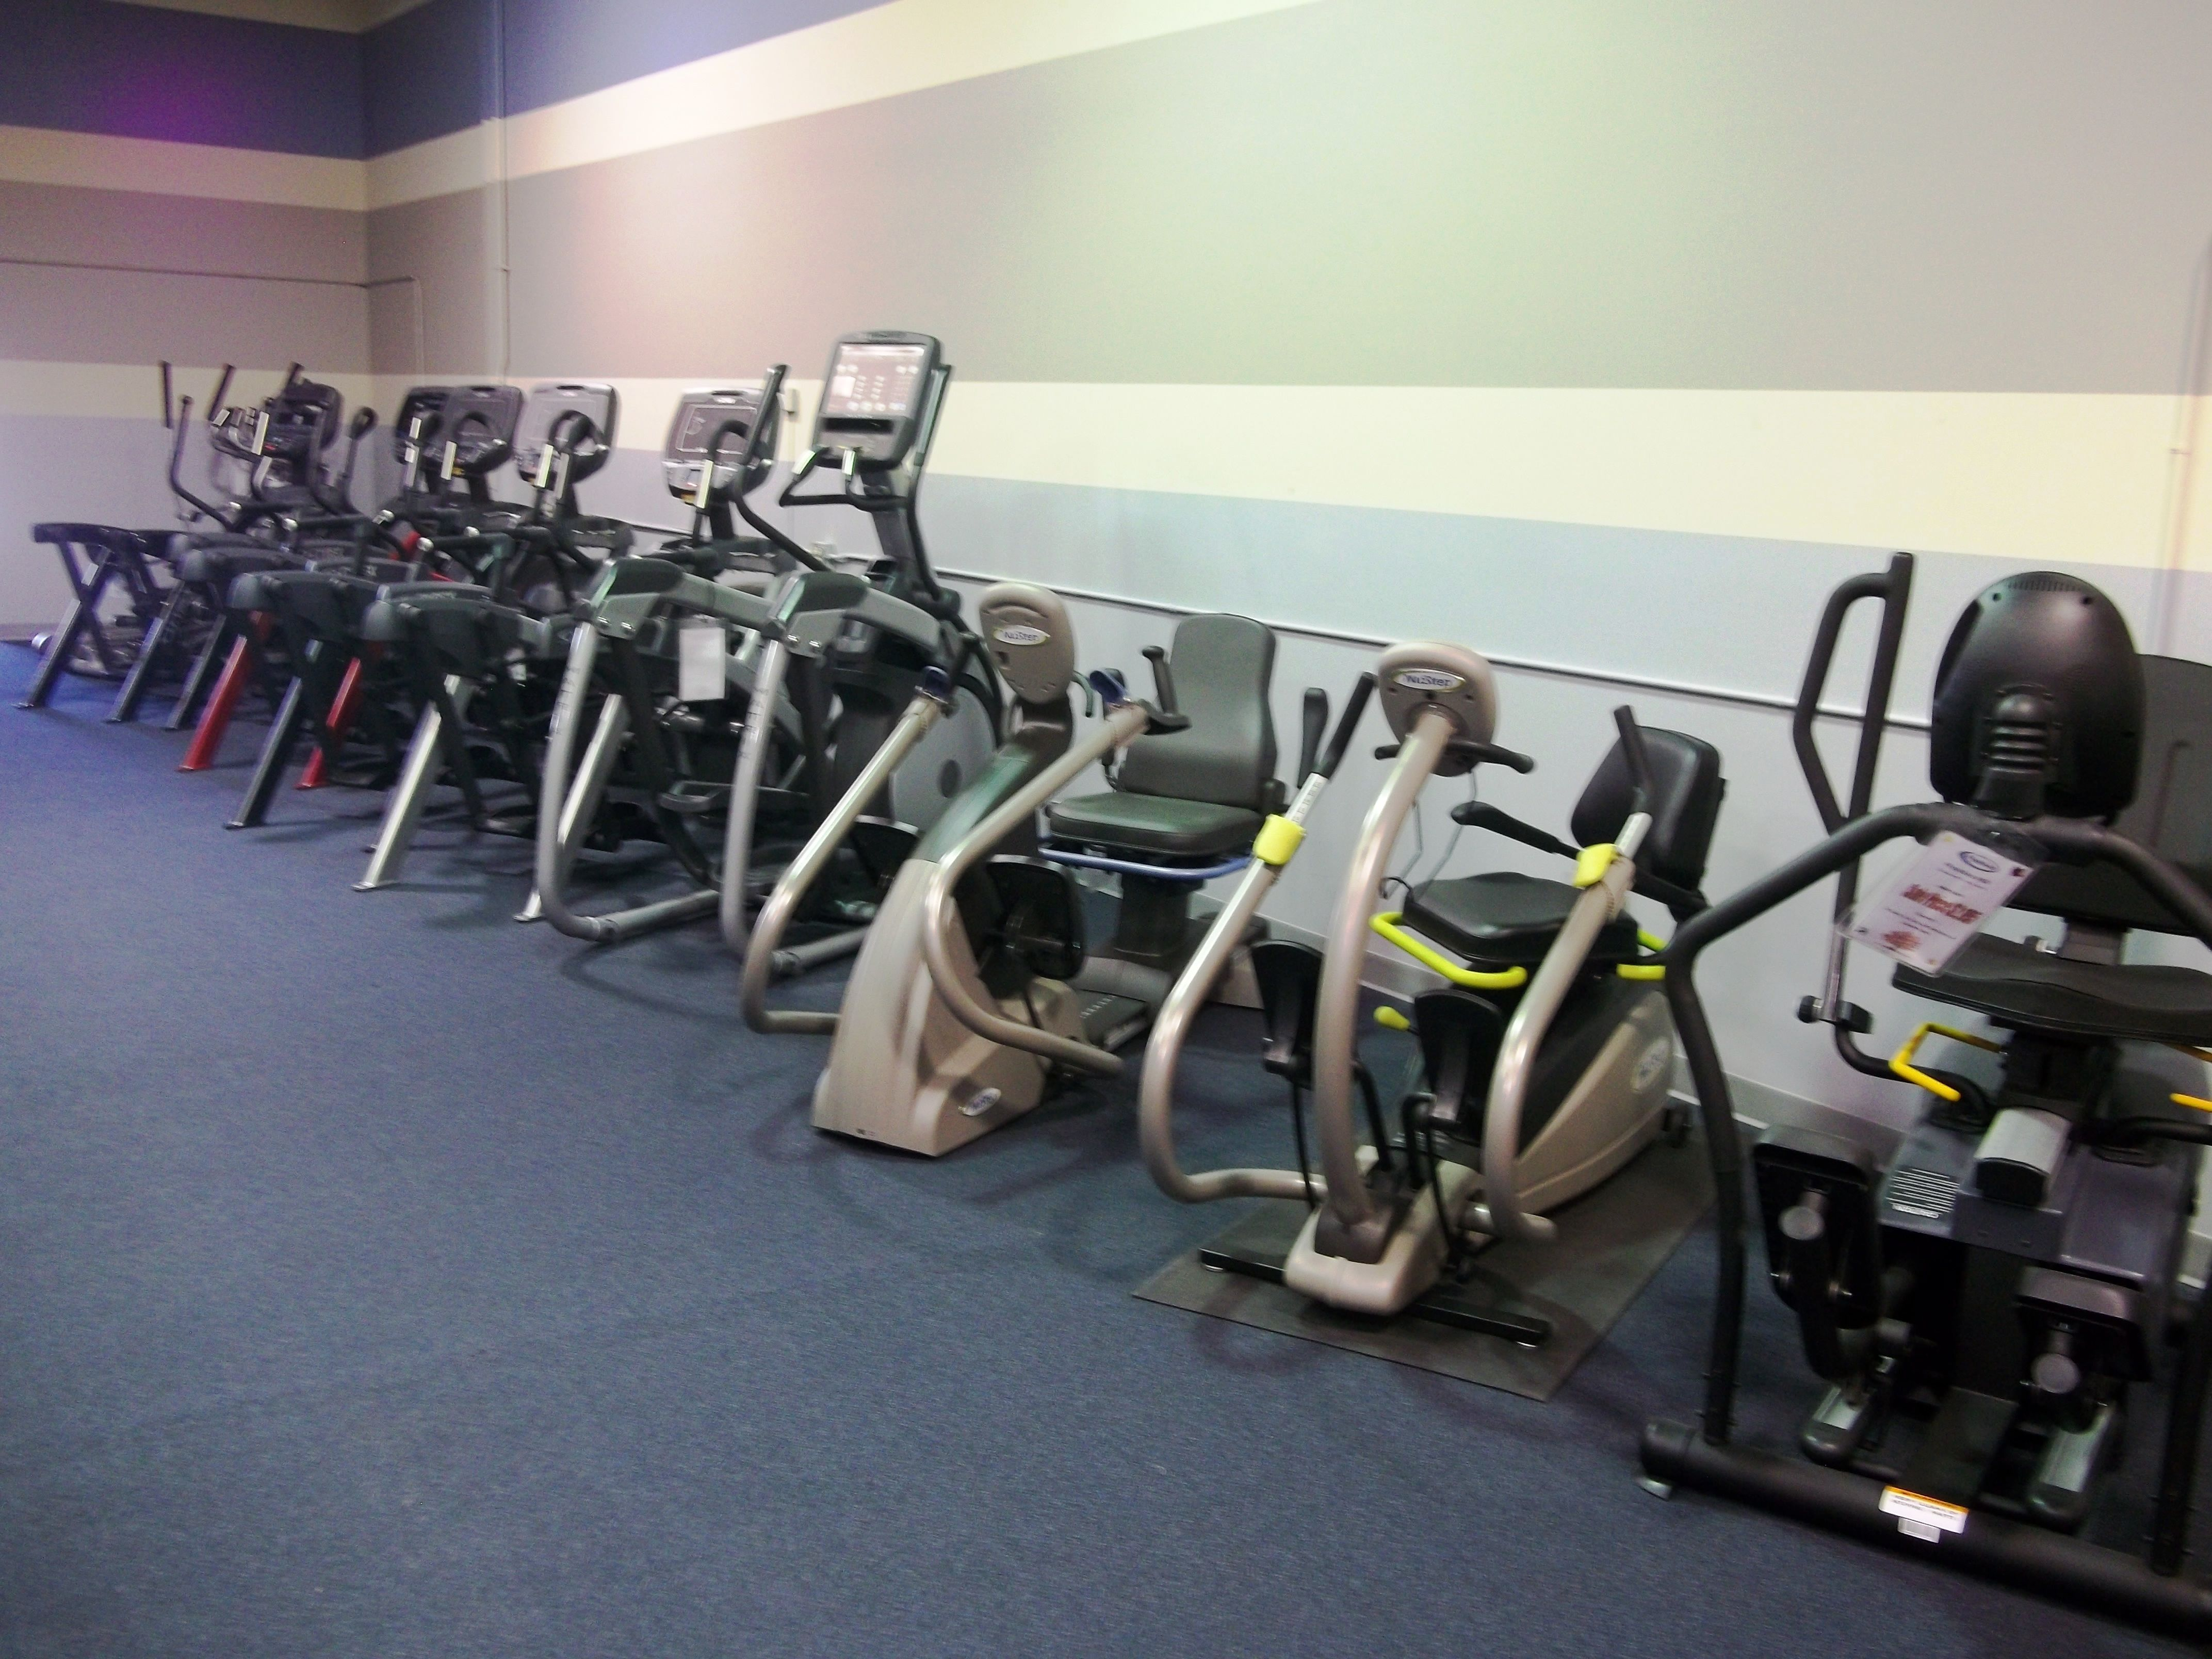 Nova fitness equipment no equipment workout equipment